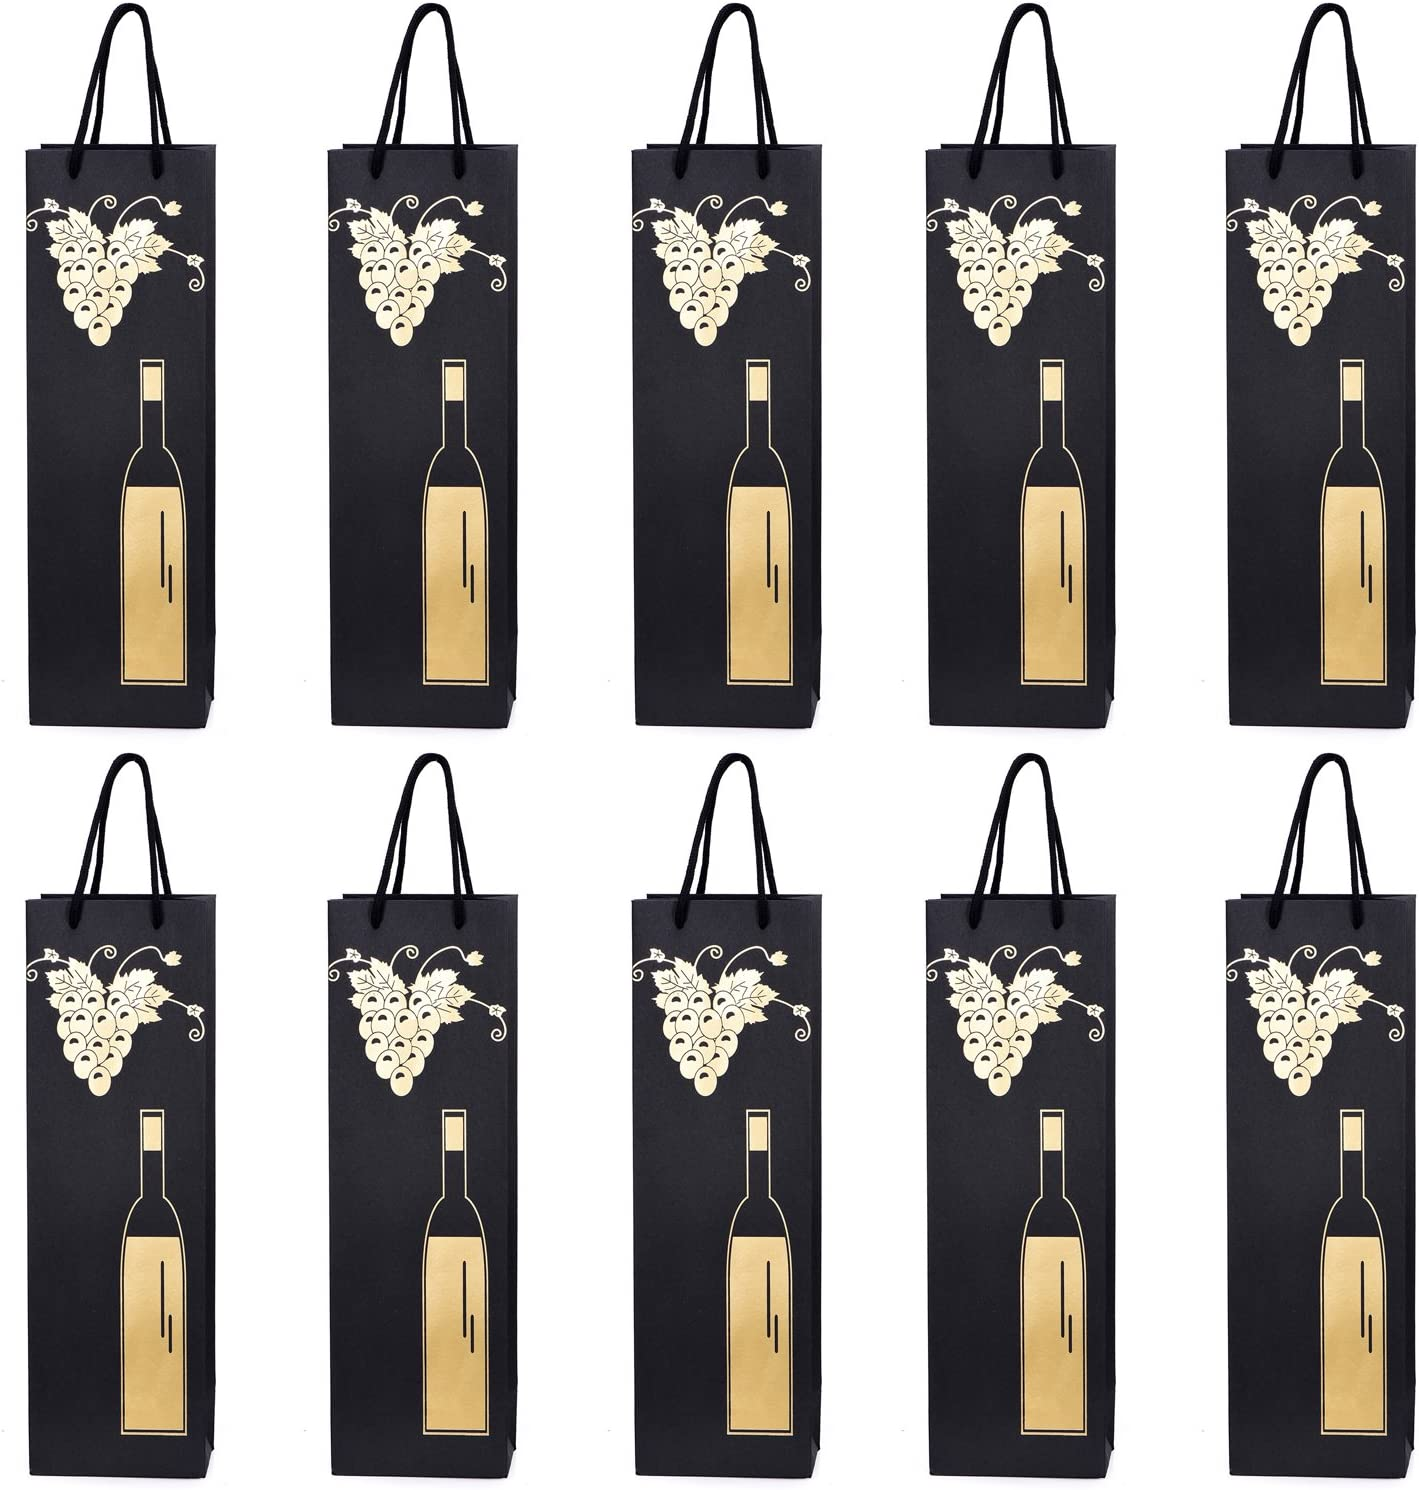 10 bolsas para botellas, bolsas de regalo para vino, prosecco y champán 40 x 12 x 9 cm - Vid de uva oro